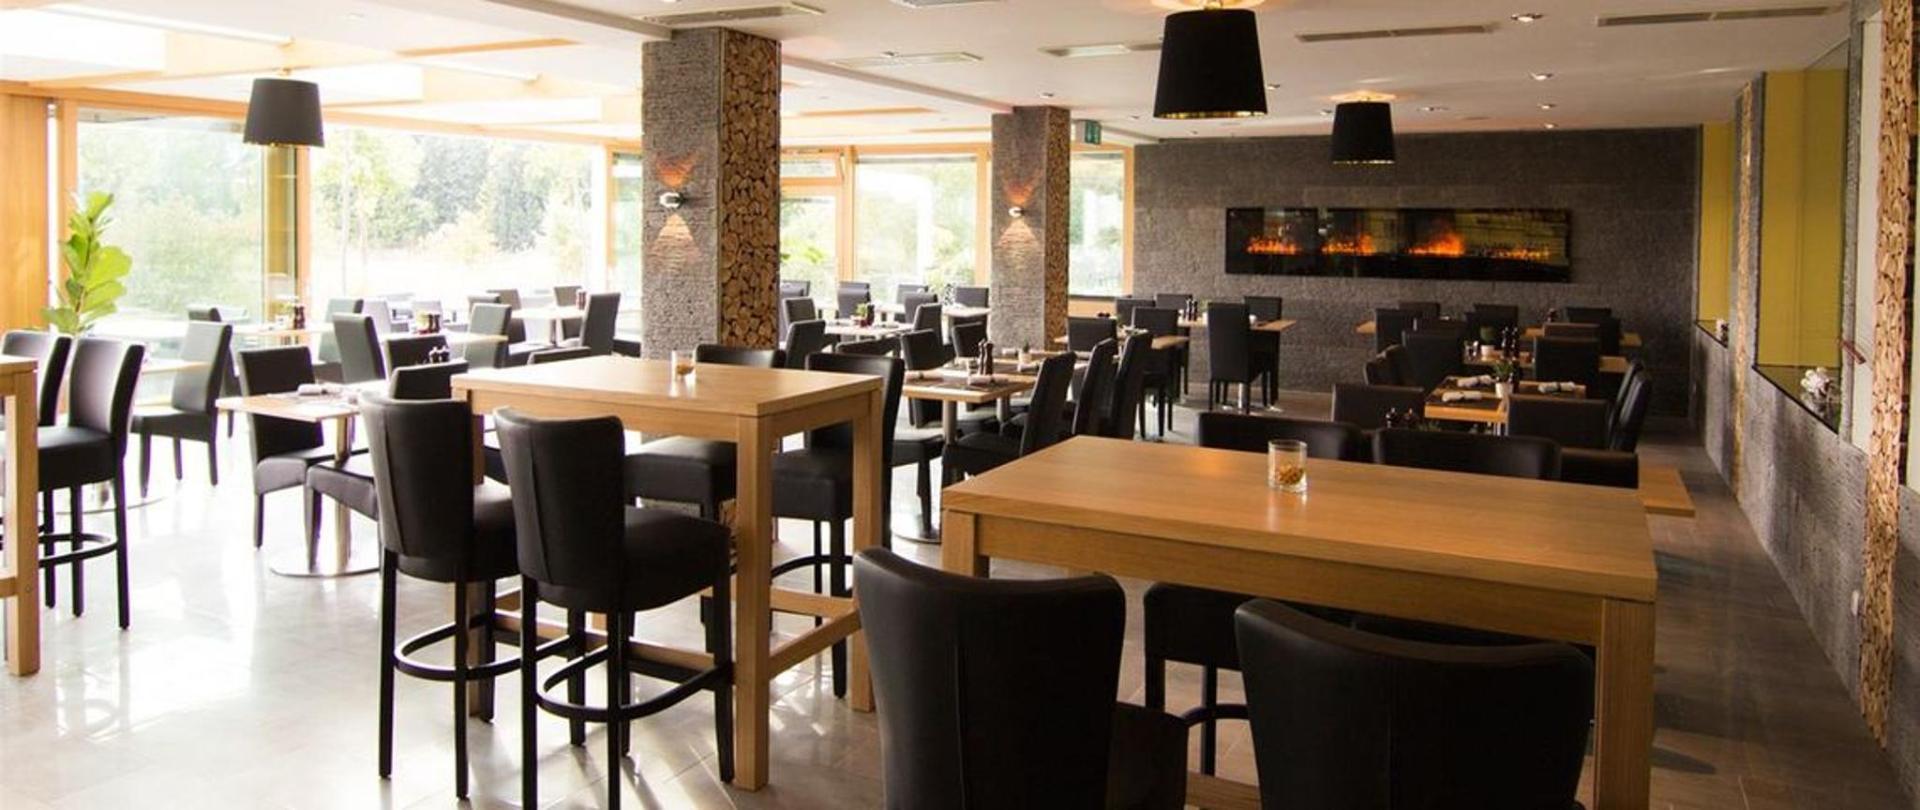 restaurant3-kopie.jpg.1140x481_0_11_5937.jpg